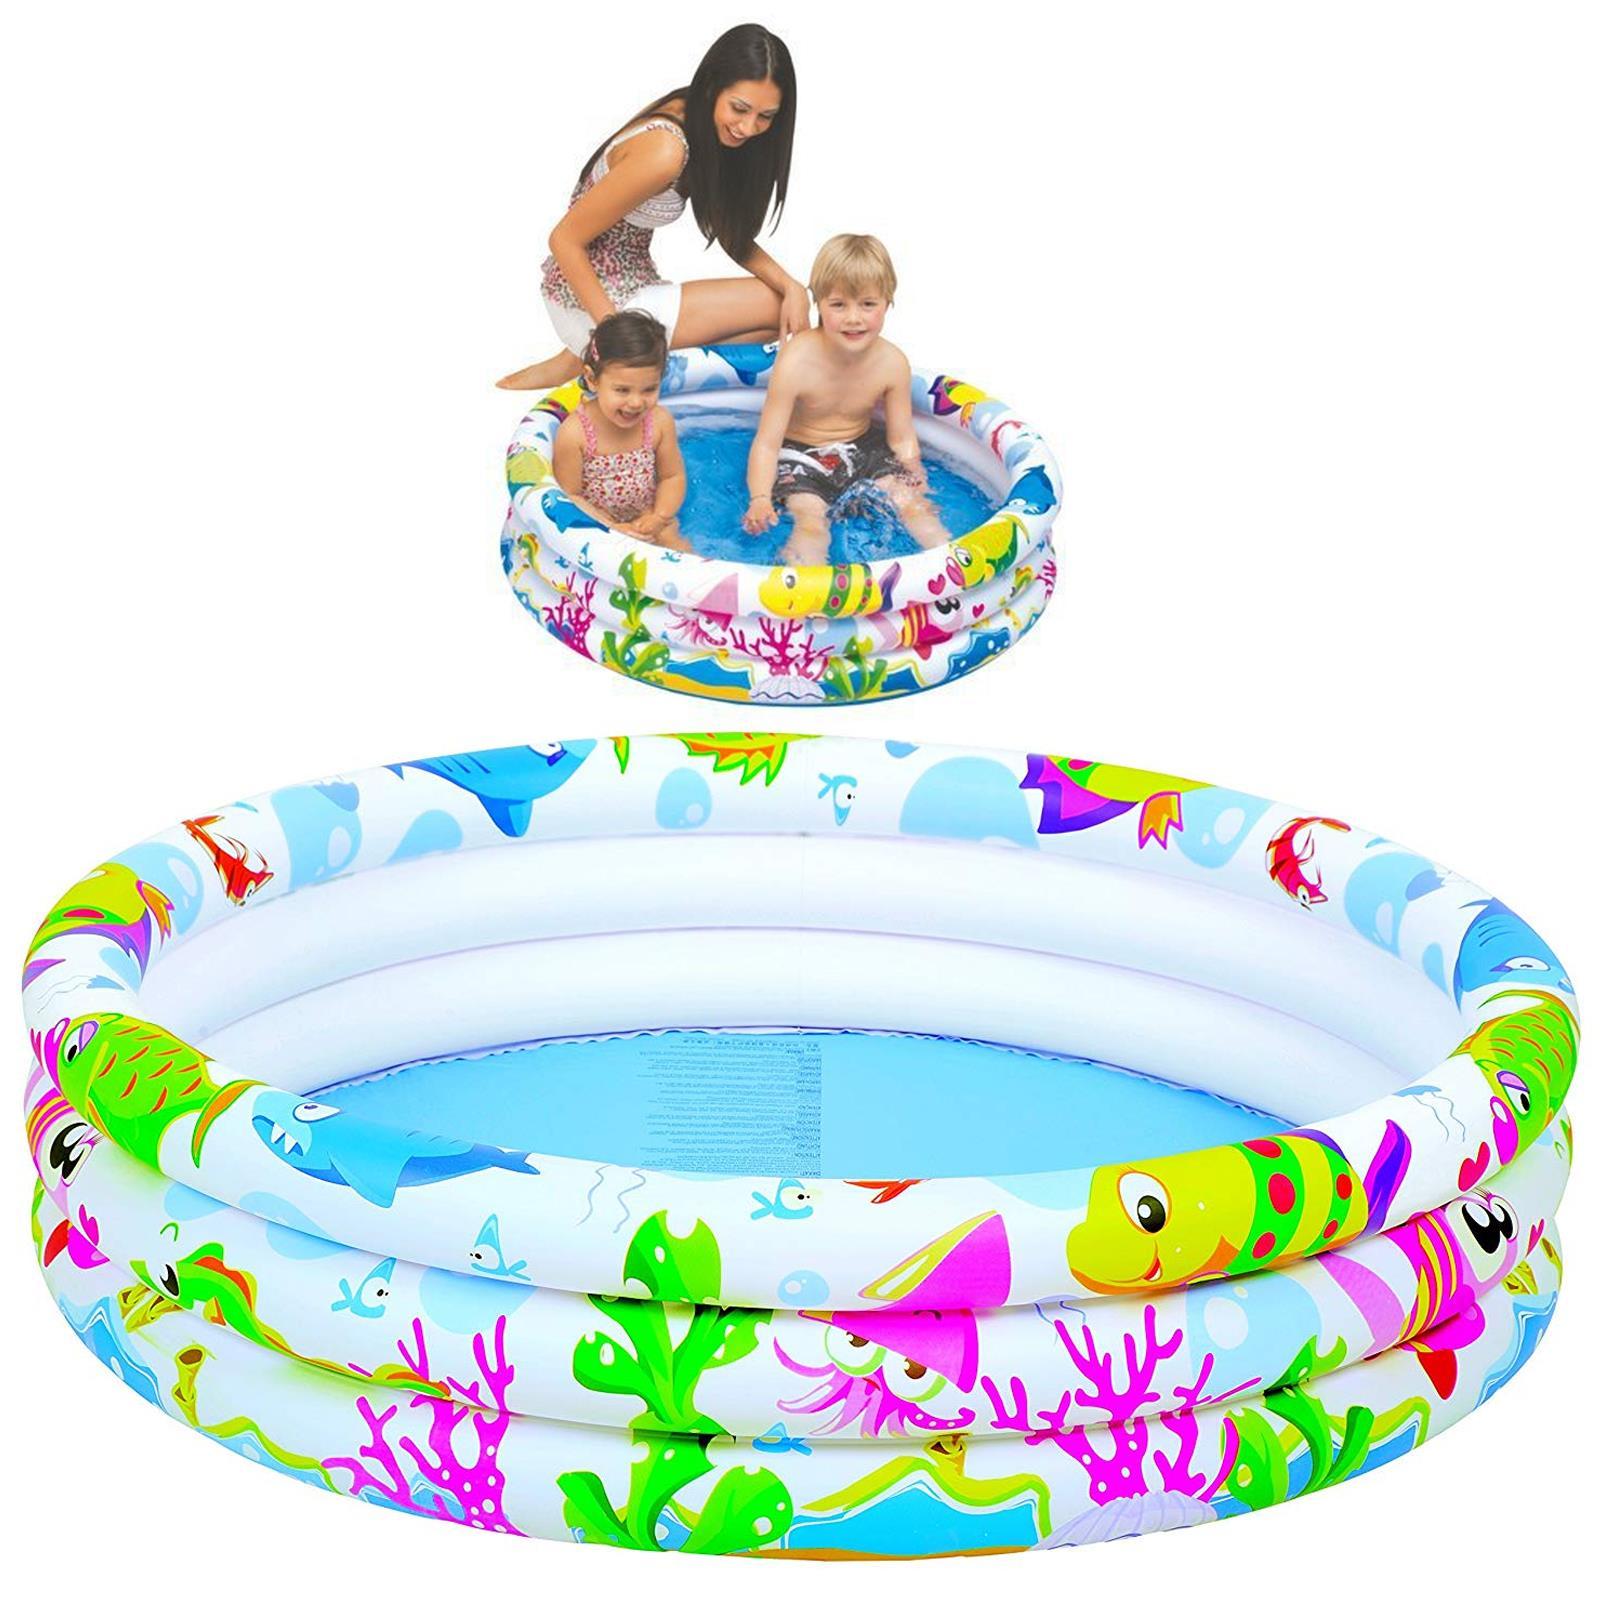 Kids-Play-3-Anillo-Inflable-Centro-De-Natacion-Piscina-Infantil-Mar-Vida-al-Aire-Libre-Diversion miniatura 4